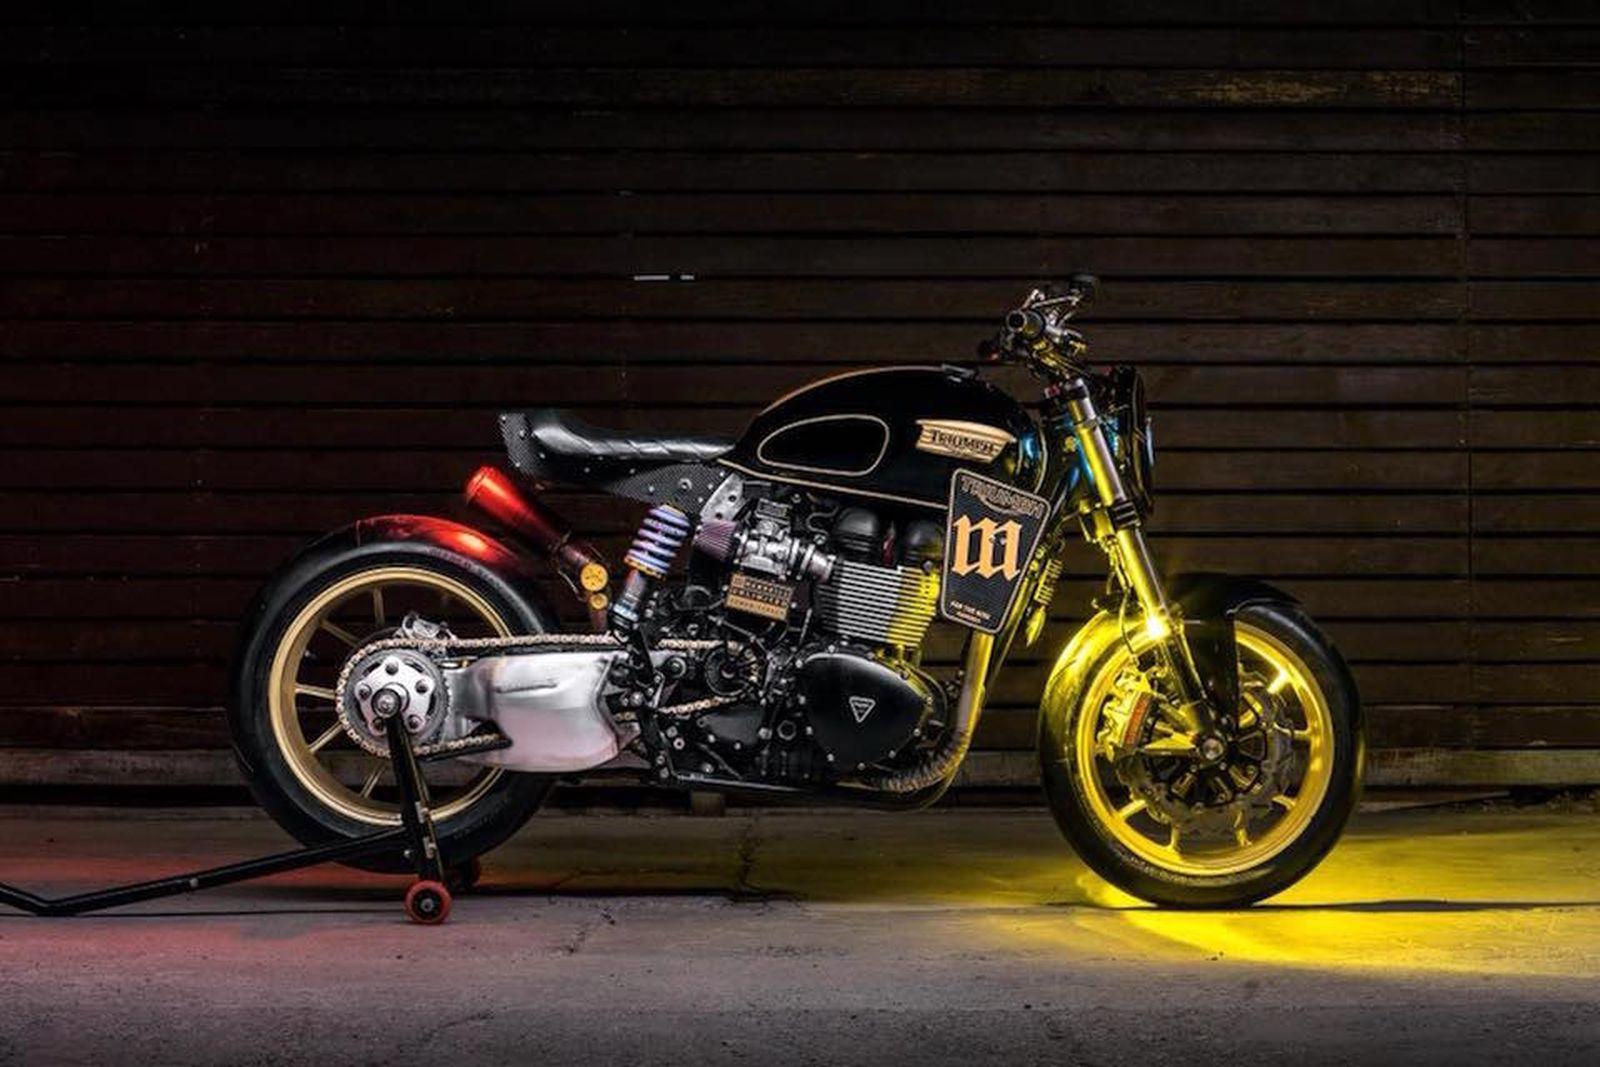 mandrill garage power street triumph t100 racer